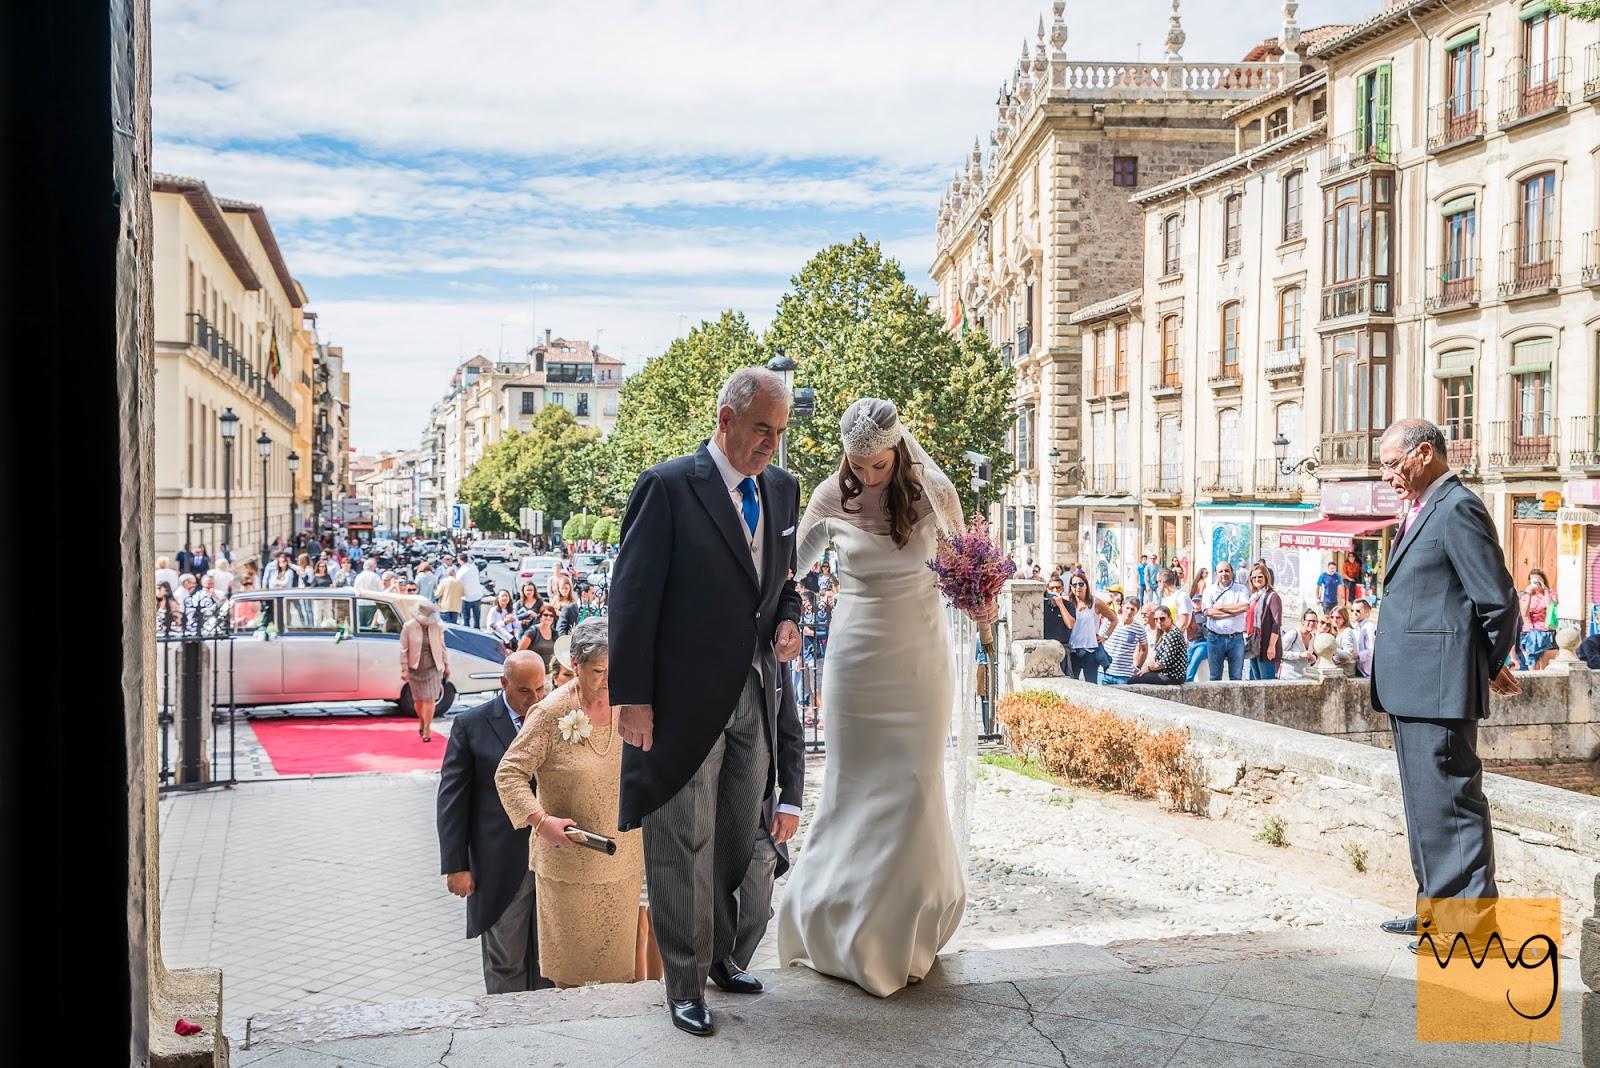 Fotografía de boda, Entrando en la Iglesia de Santa Ana